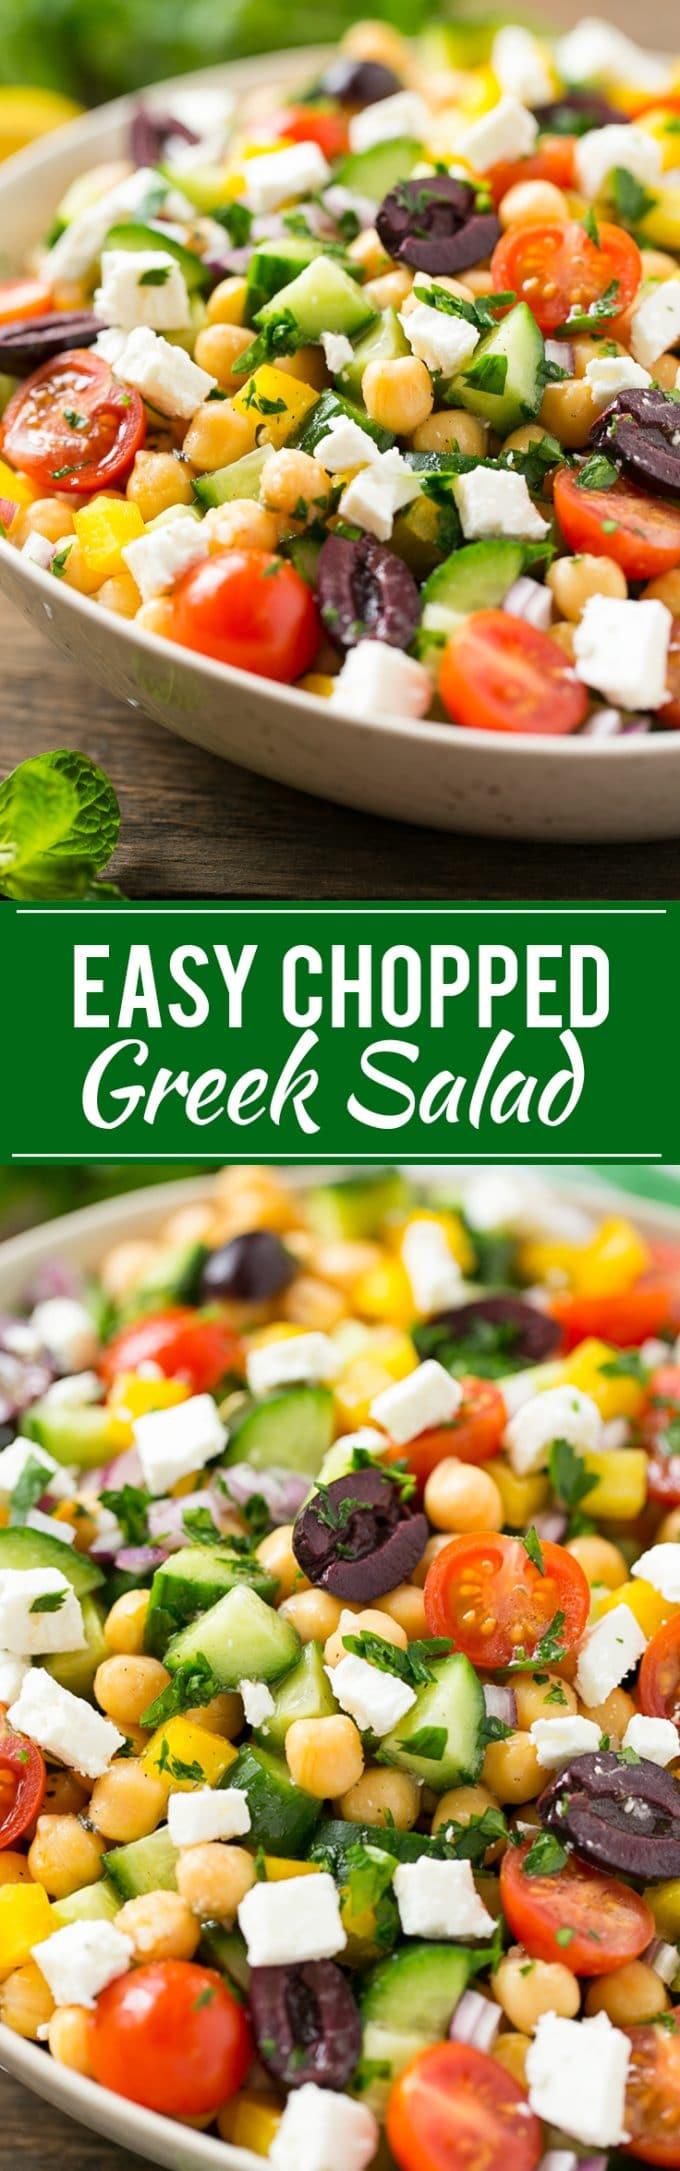 Chopped Greek Salad Recipe | Chopped Greek Salad | Greek Salad | Best Chopped Greek Salad | Best Greek Salad | Easy Chopped Greek Salad | Easy Greek Salad